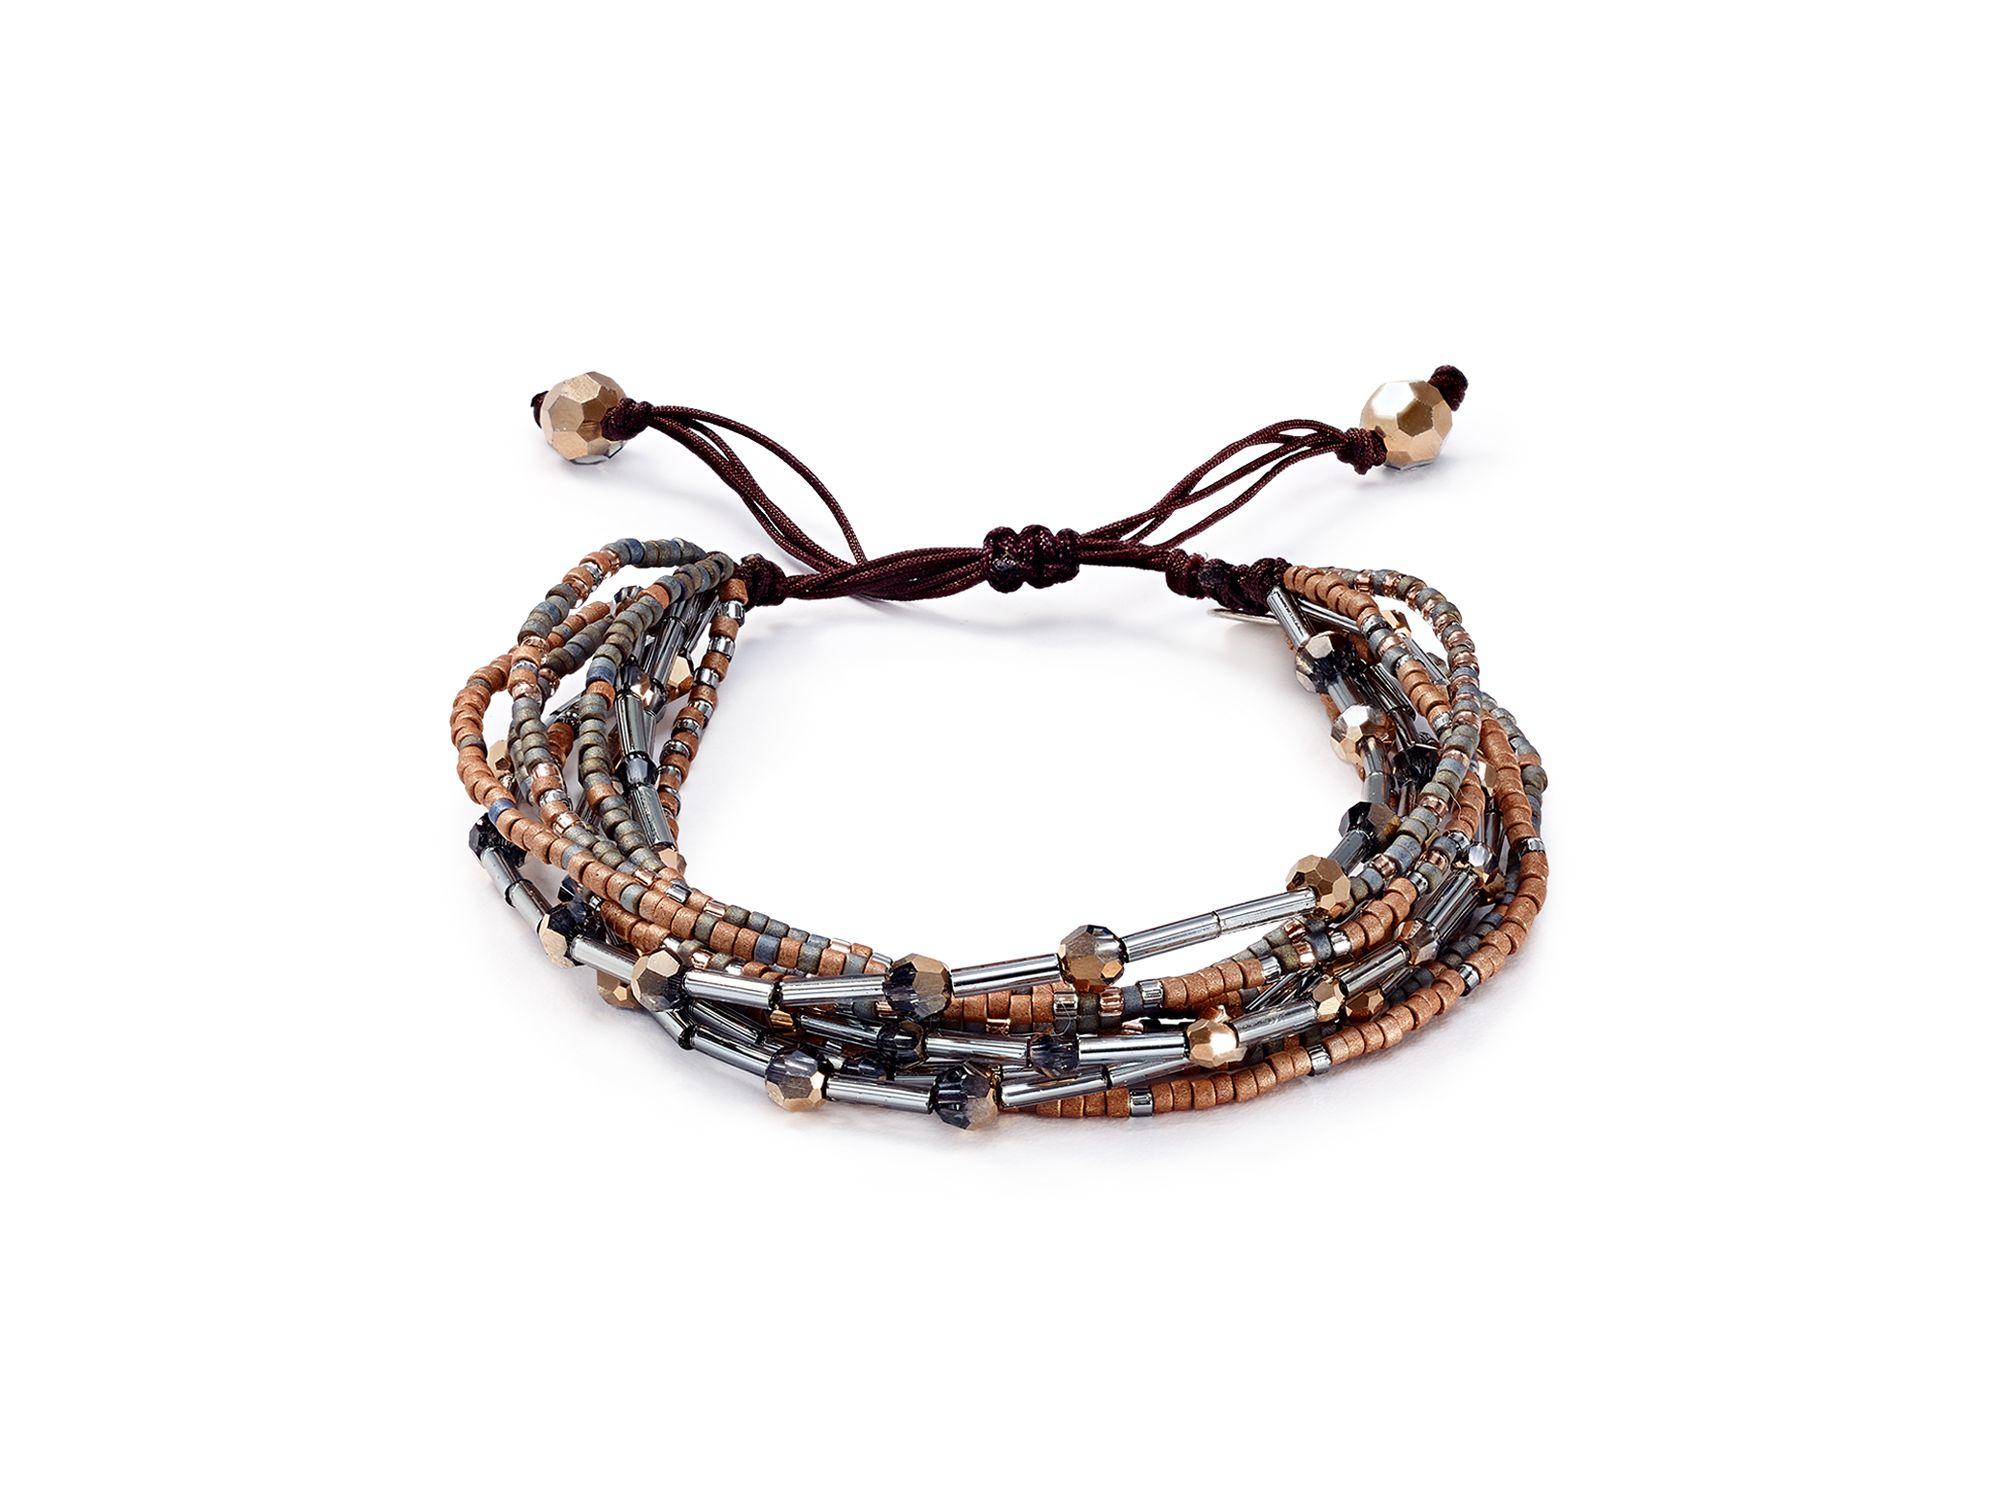 Chan luu Beaded Pull-tie Bracelet in Metallic